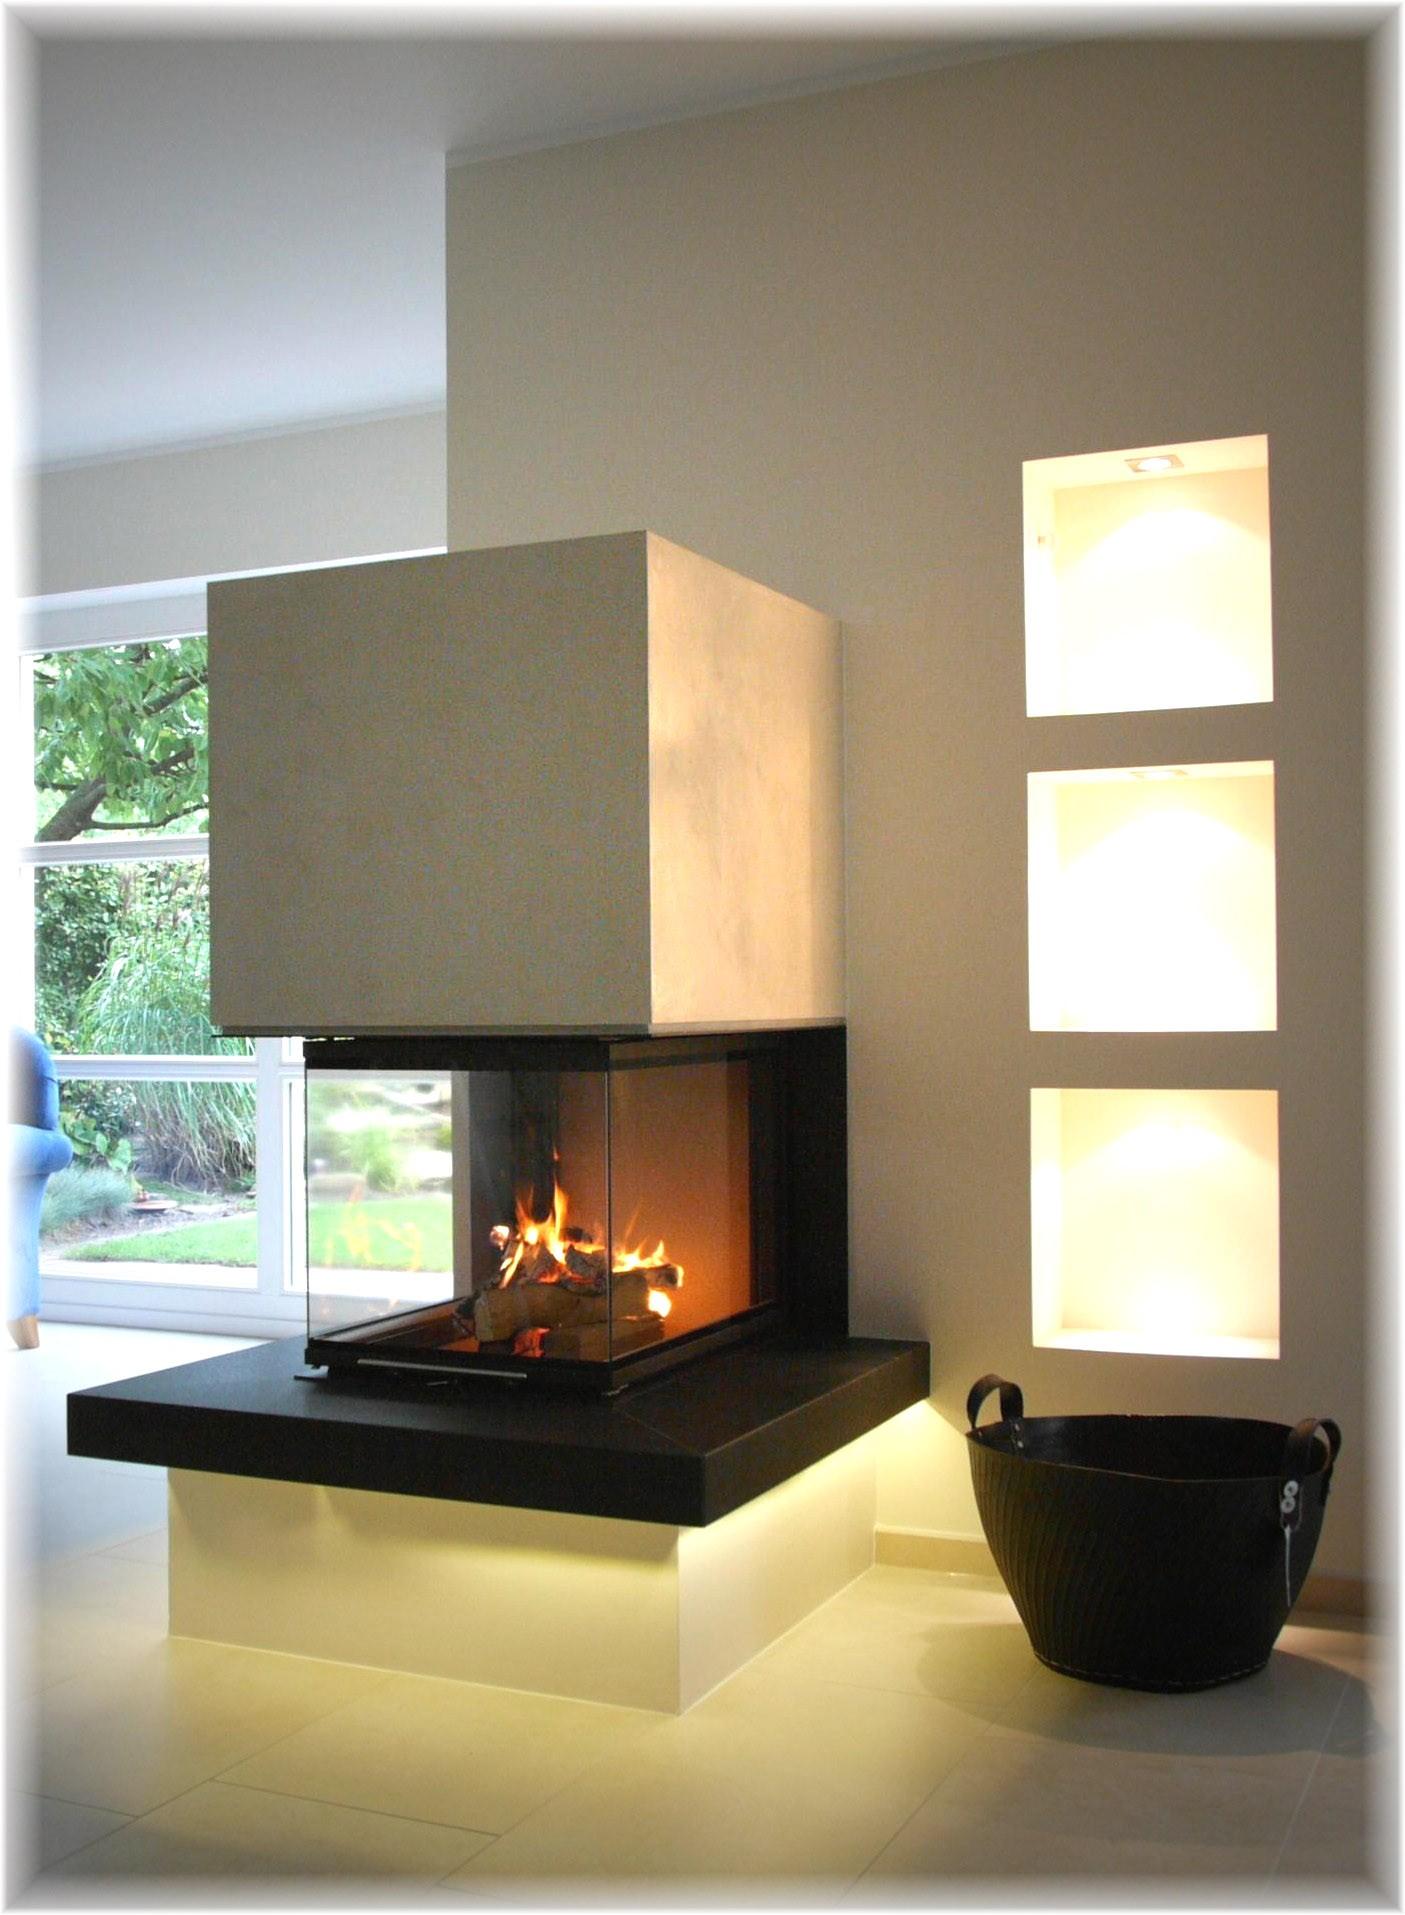 ofenbauer roland ganghofner kachelofen 84543 winh ring unterau hagos. Black Bedroom Furniture Sets. Home Design Ideas